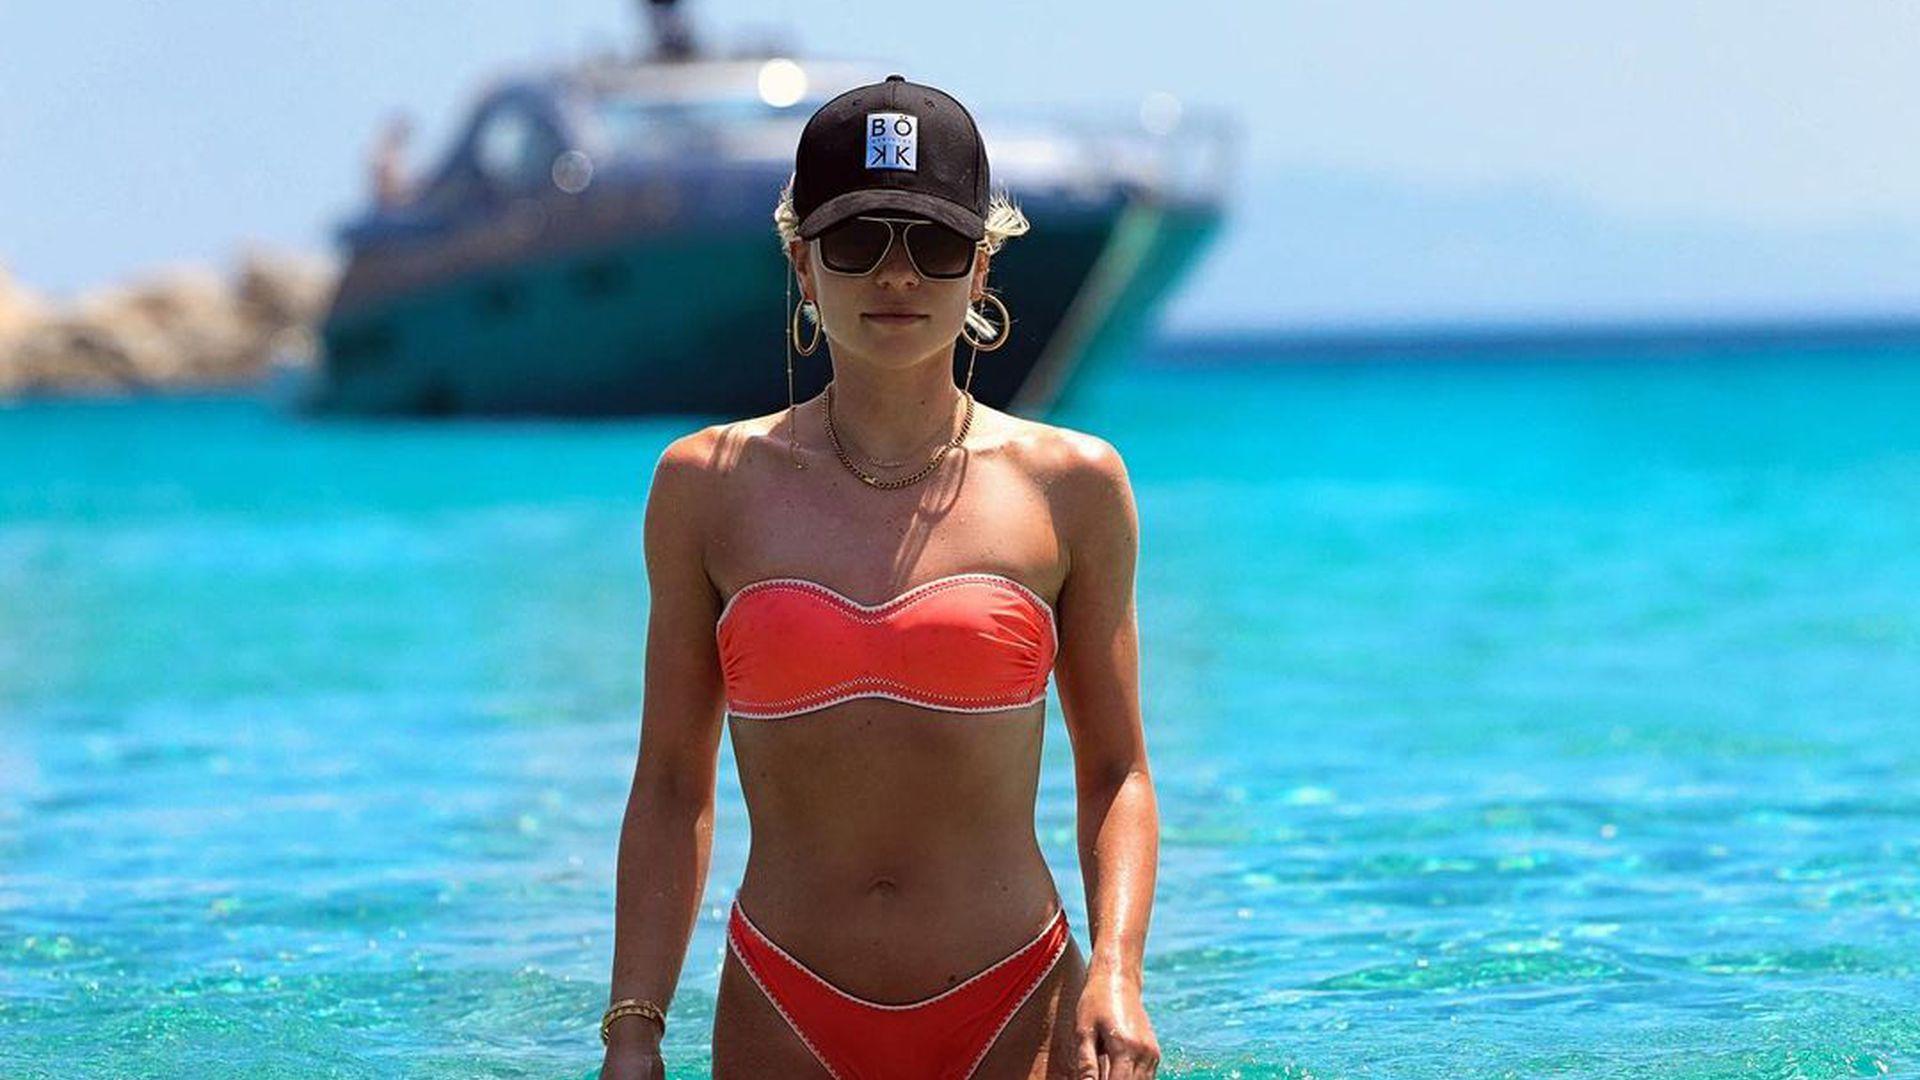 Bikini cheyenne pahde Cheyenne Pahde: